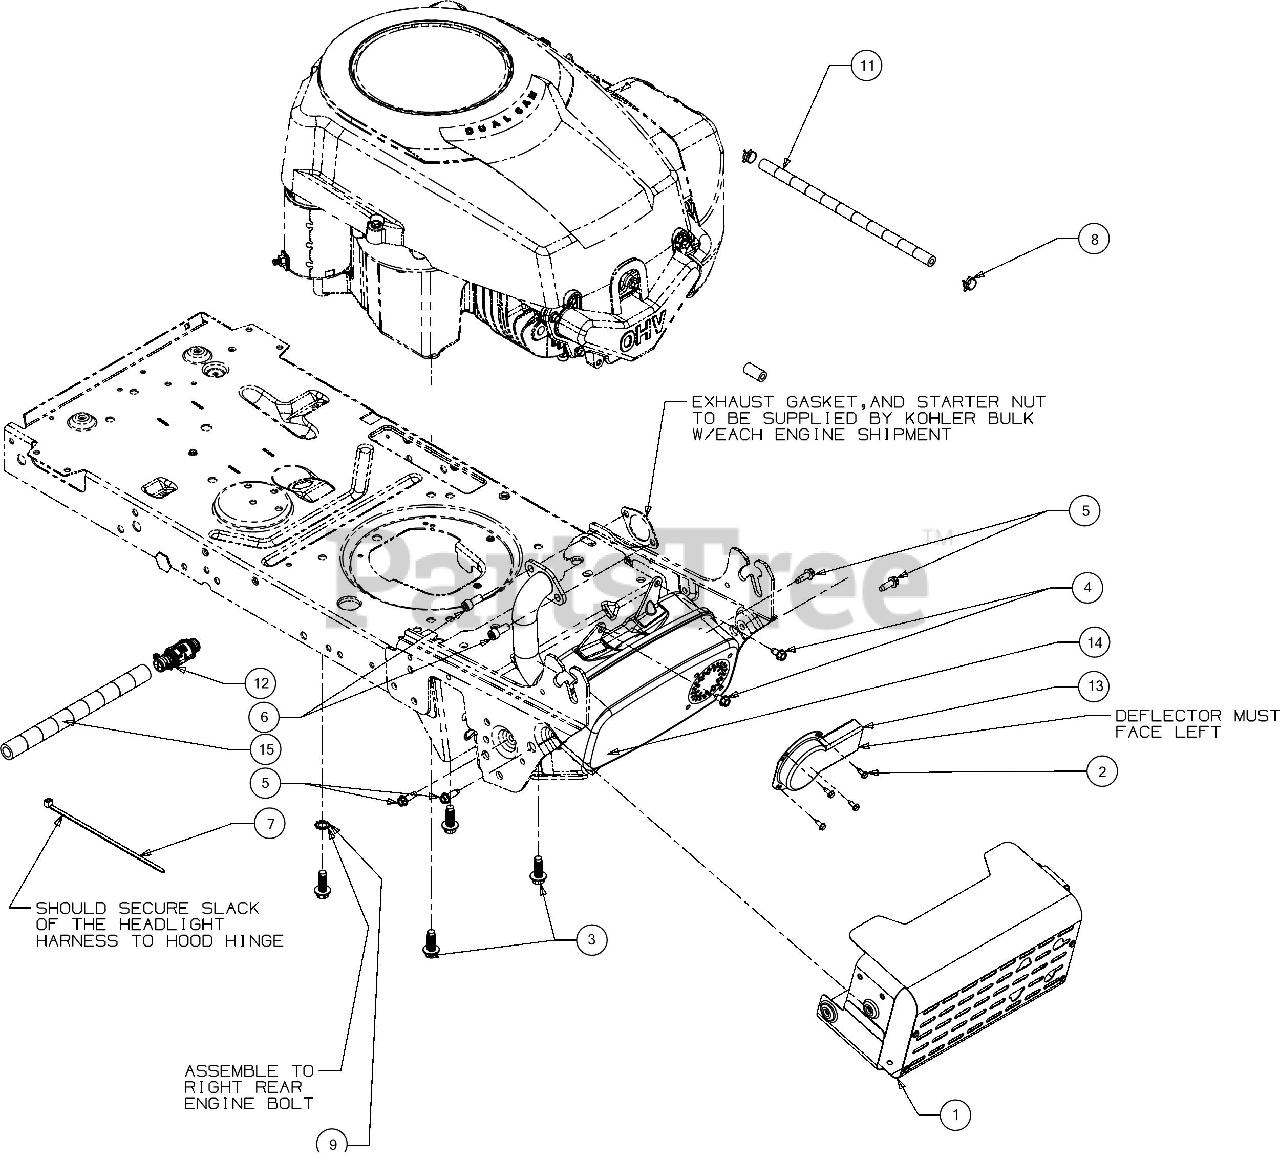 bronco engine diagram troy bilt 13wv78ks011 troy bilt bronco lawn tractor  2016  troy bilt bronco lawn tractor